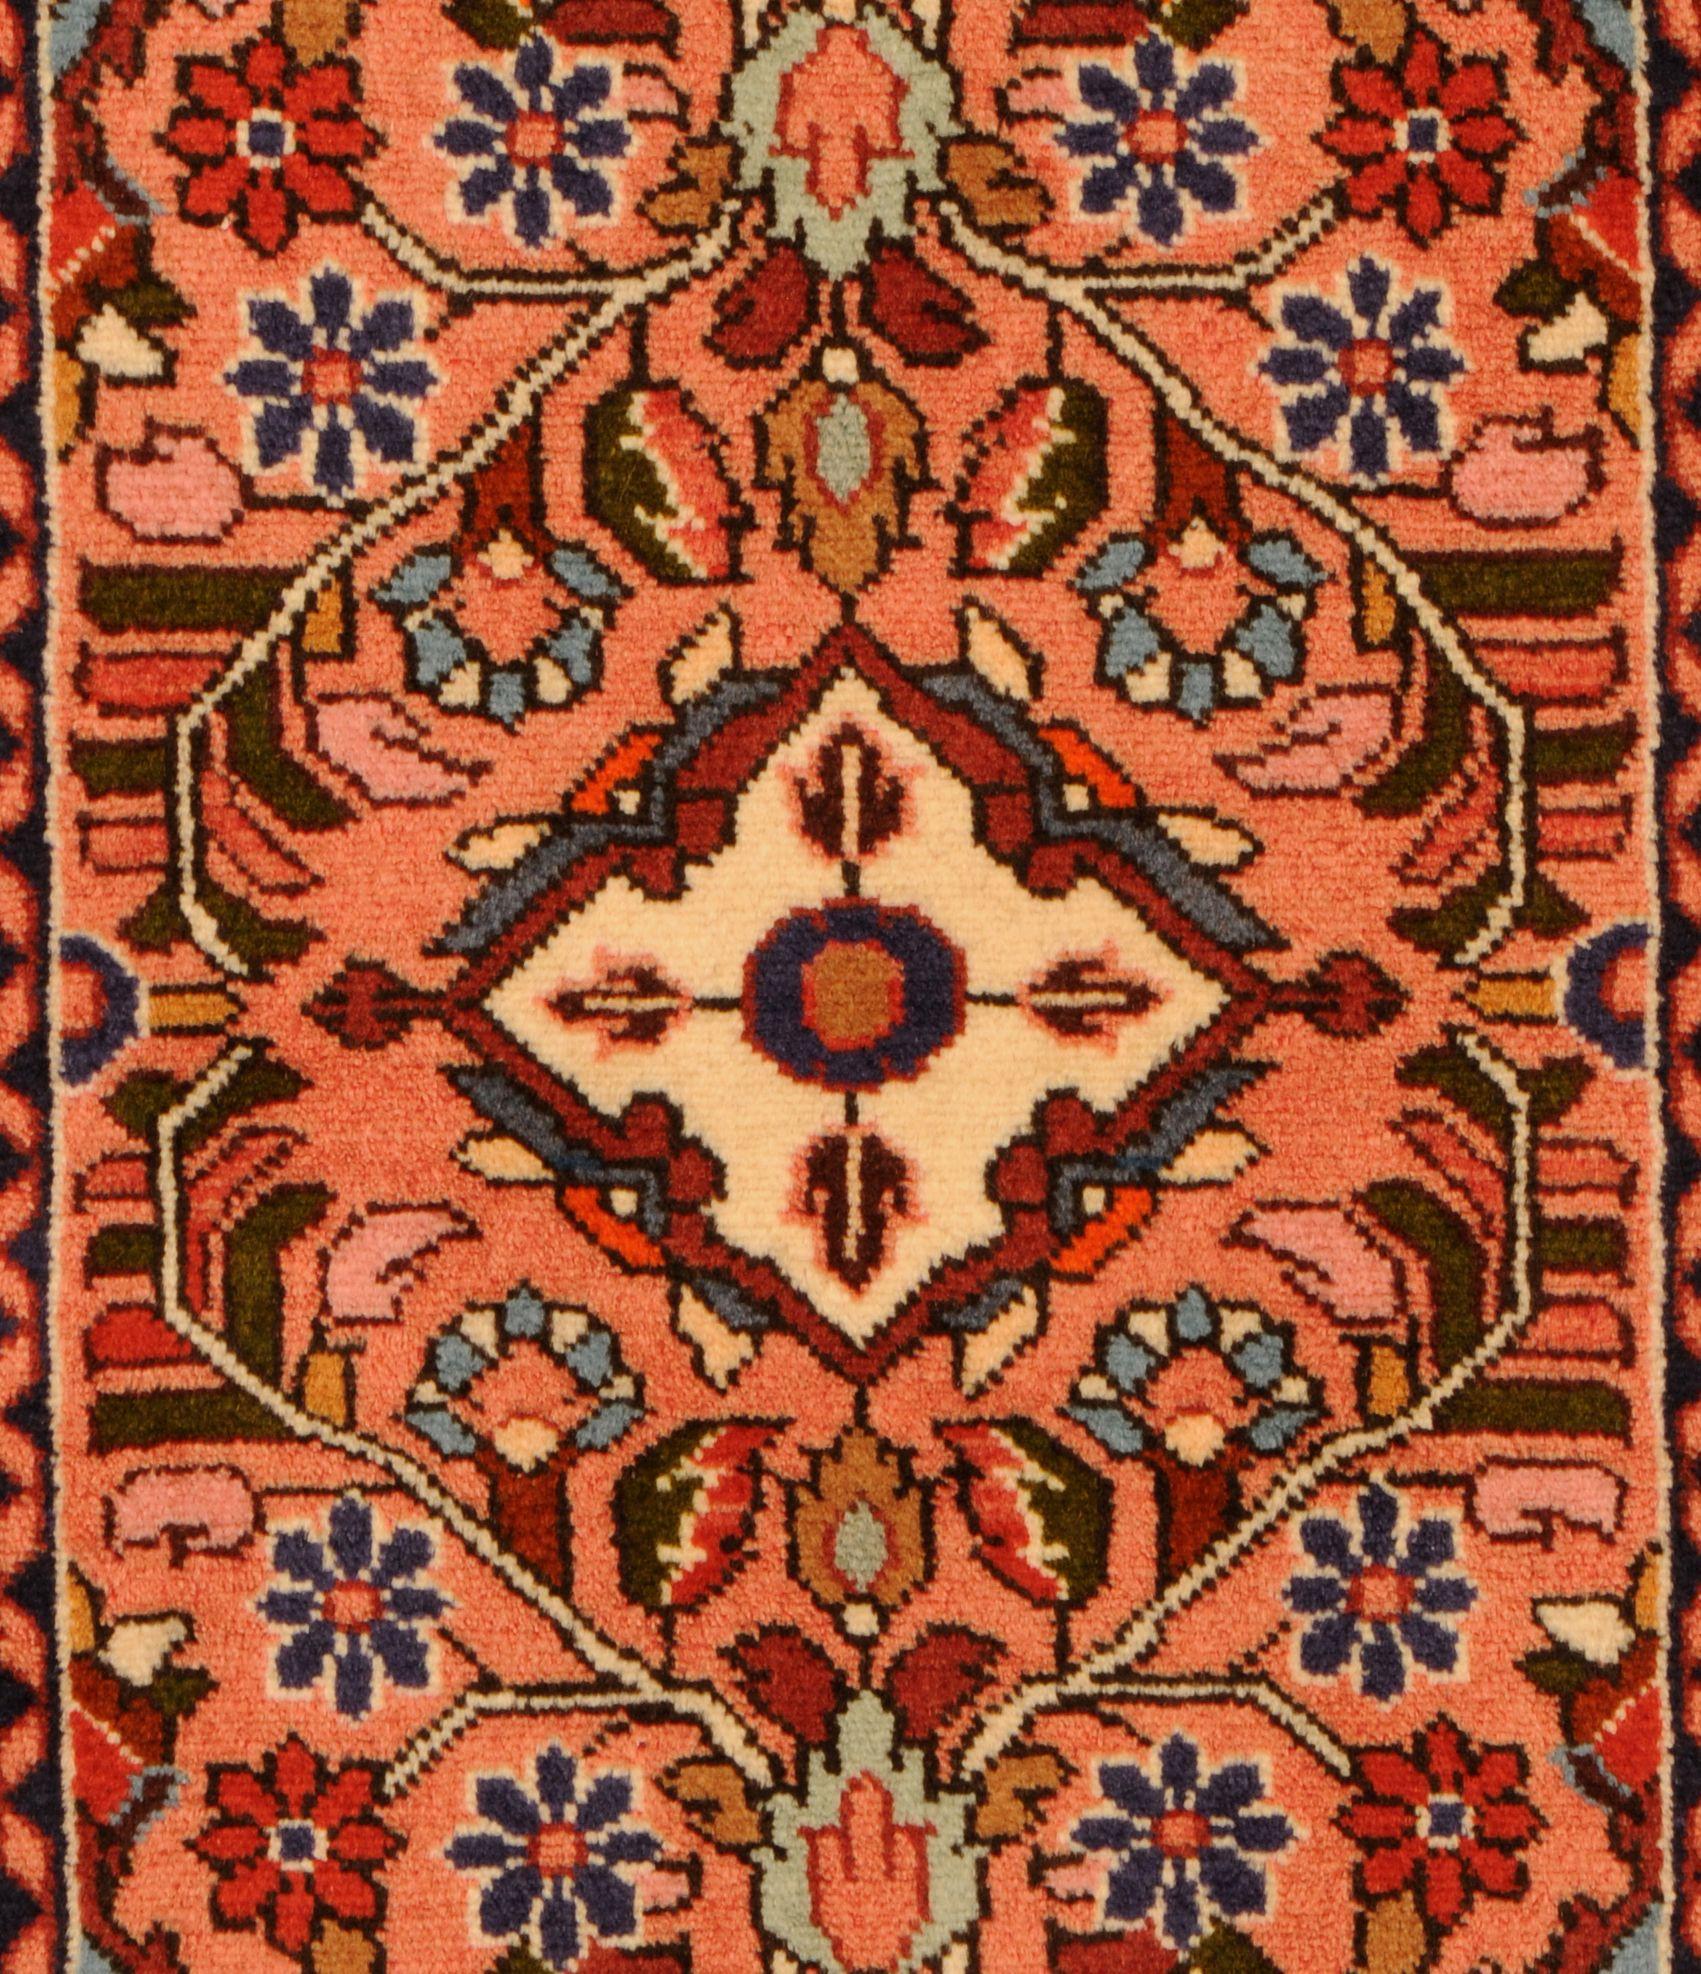 persian carpet patterns - Google Search | Iran | Pinterest ... for Aladdin Carpet Design  183qdu